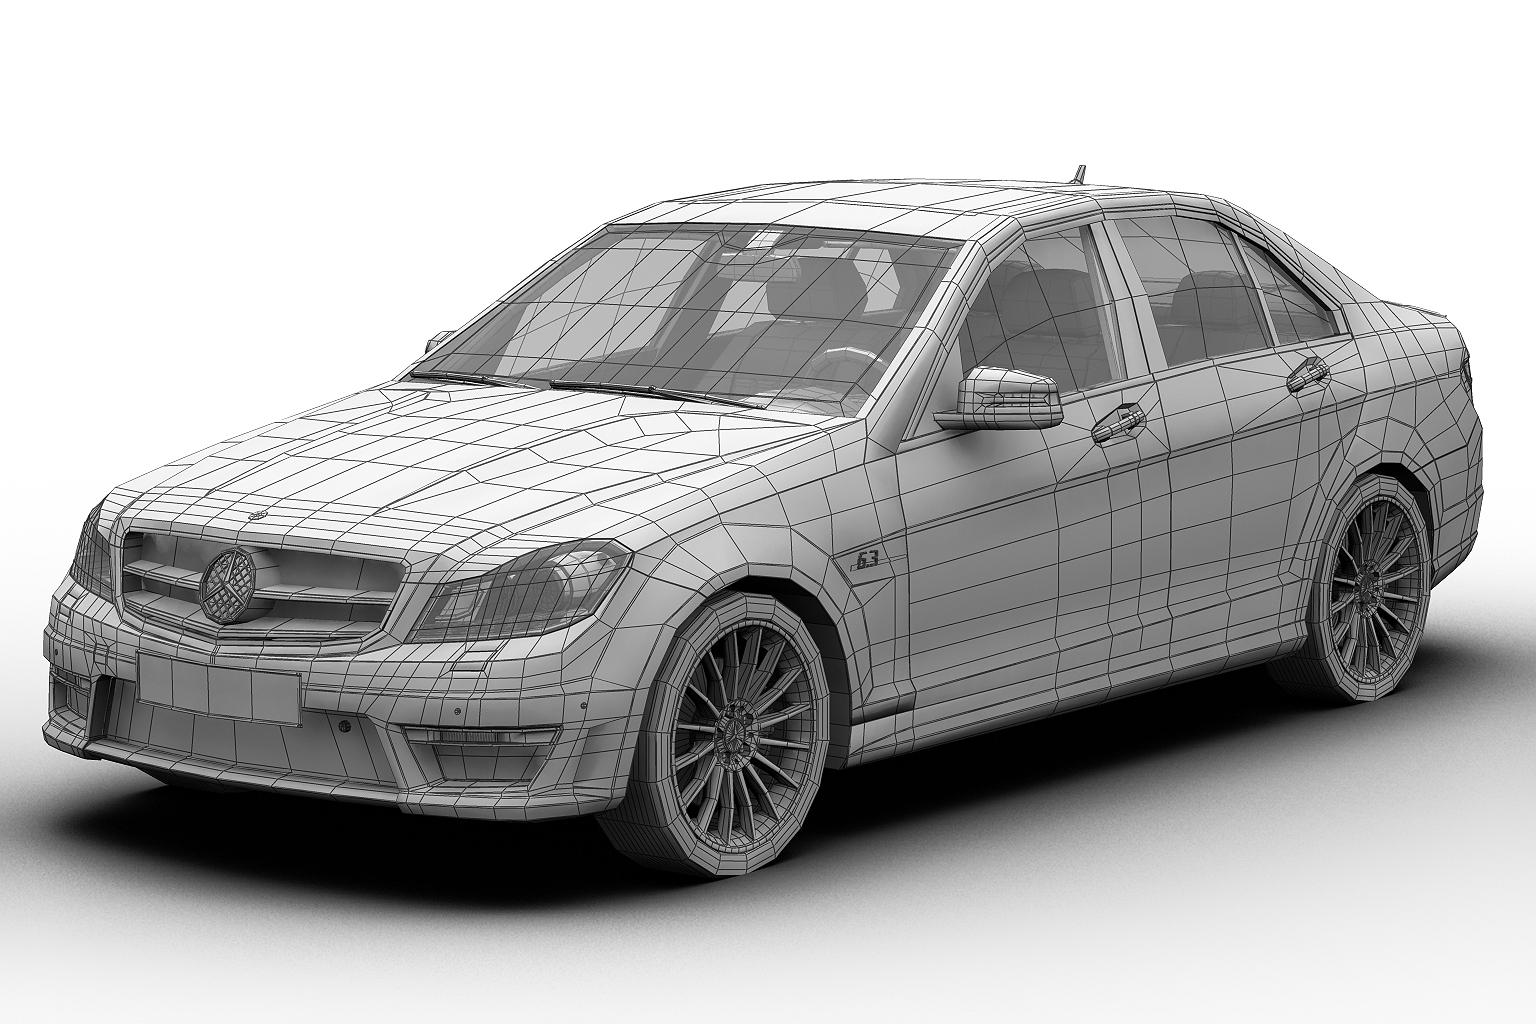 2012 mercedes benz c63 amg 3d modeli 3ds max fbx c4d lwo hrc xsi obj 136255